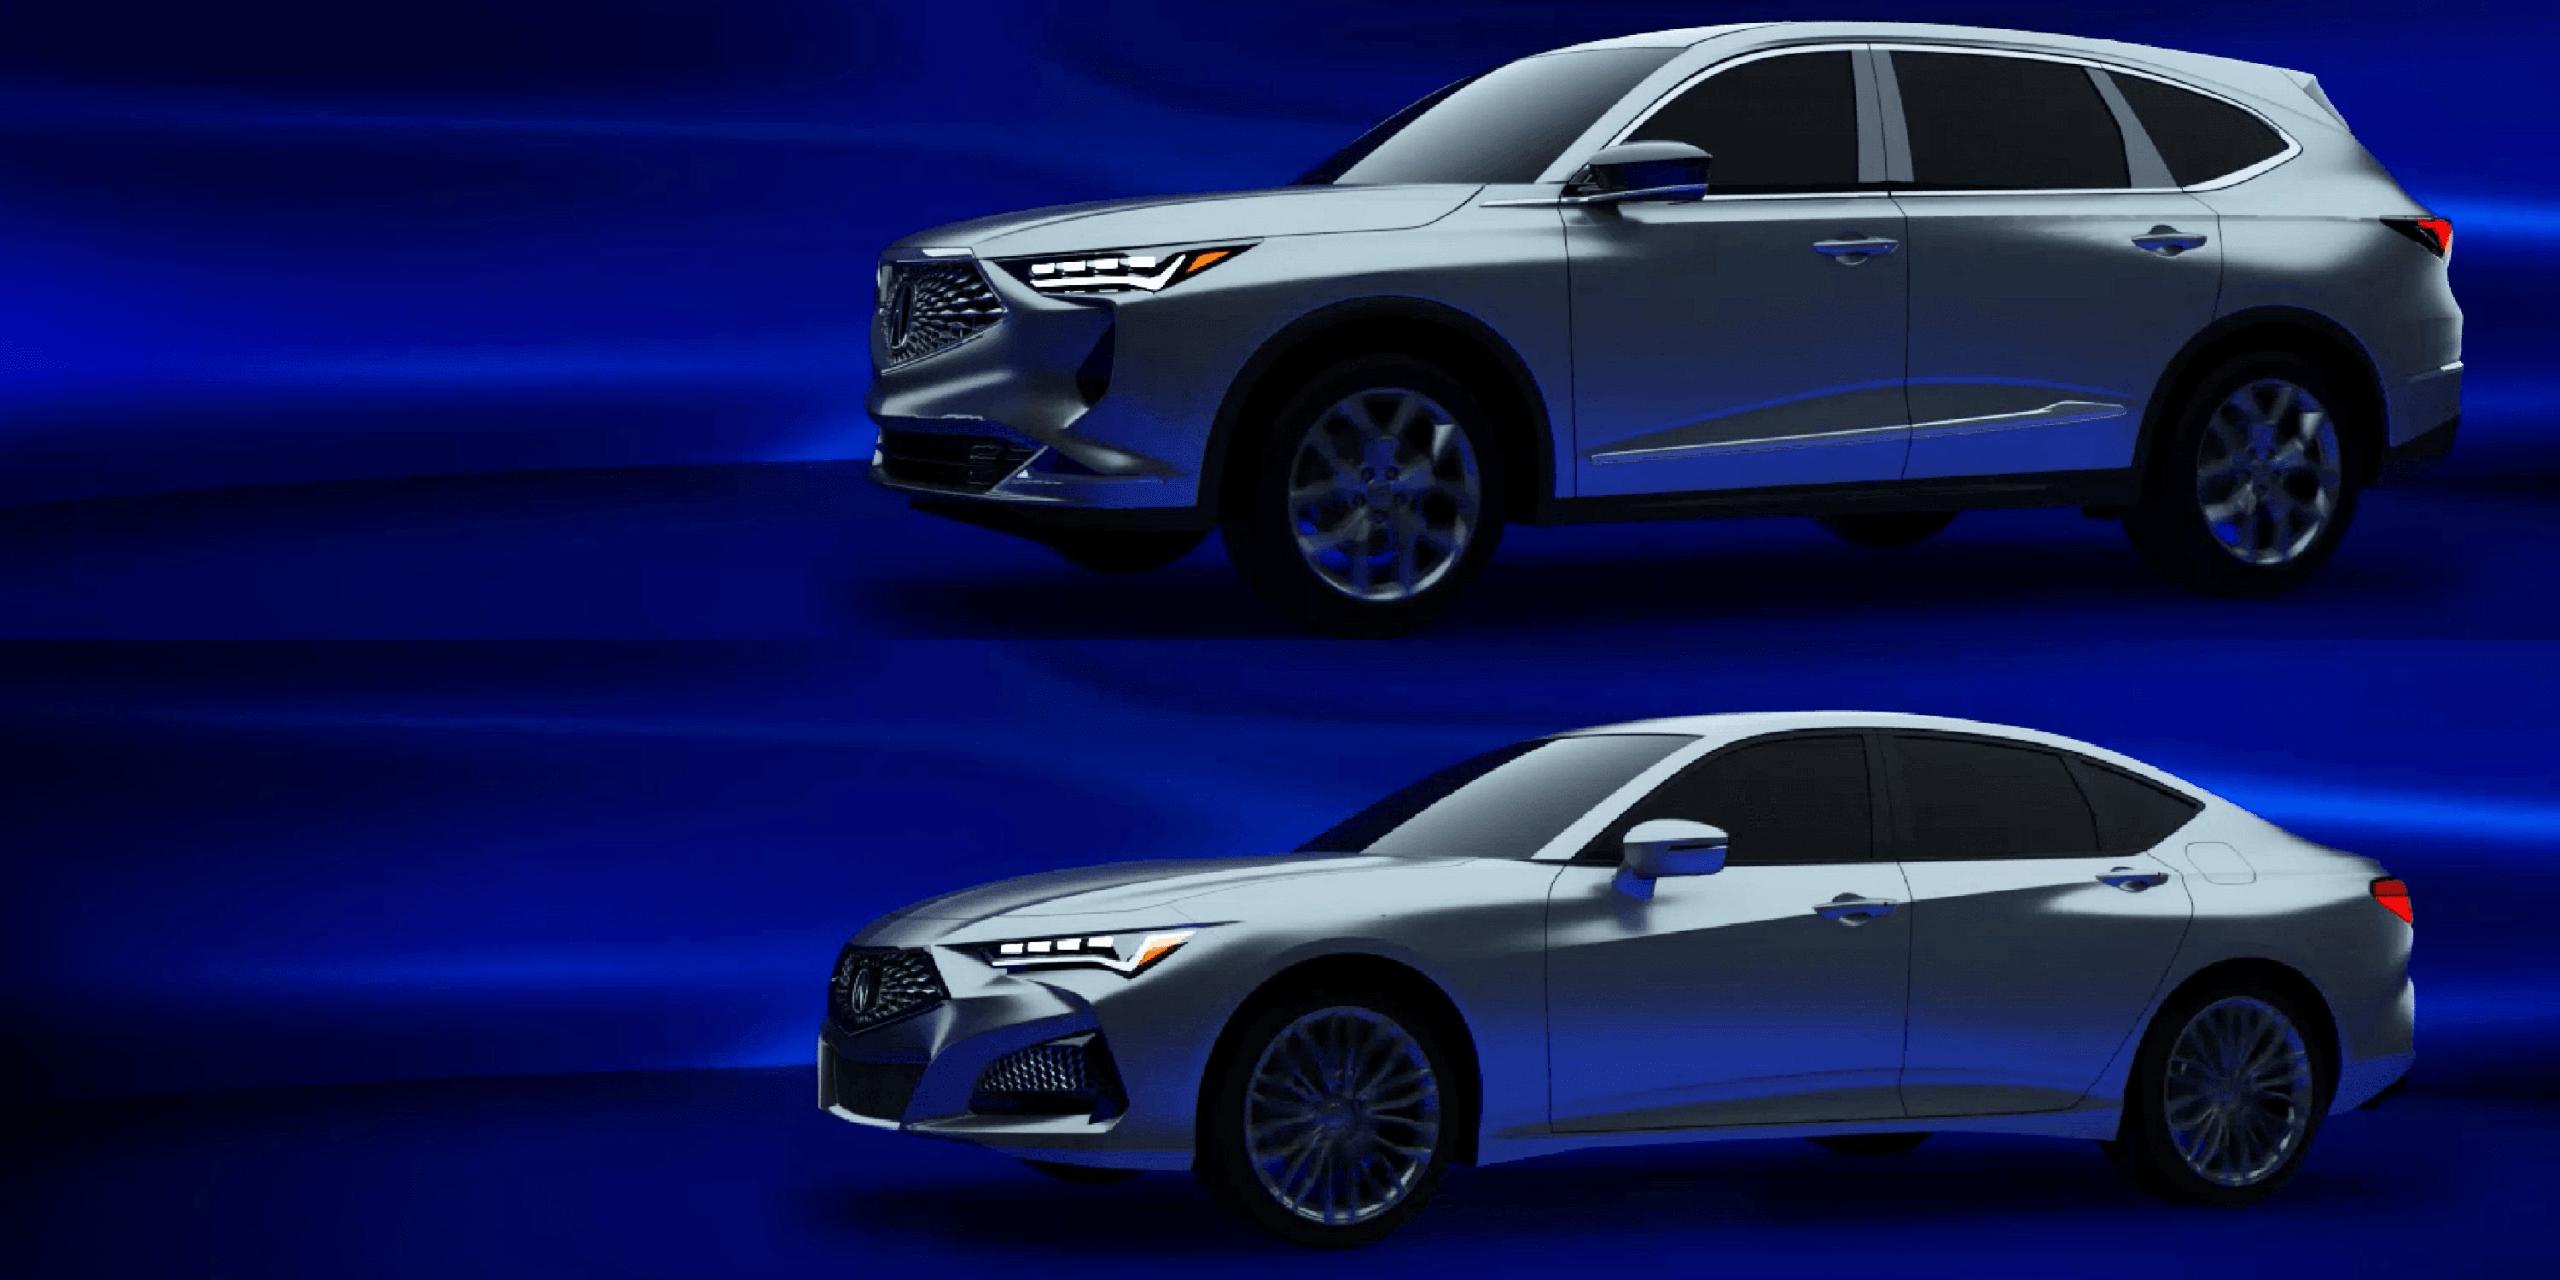 2021 Acura Tl Type S Model In 2020 Acura Mdx Acura Acura Tl